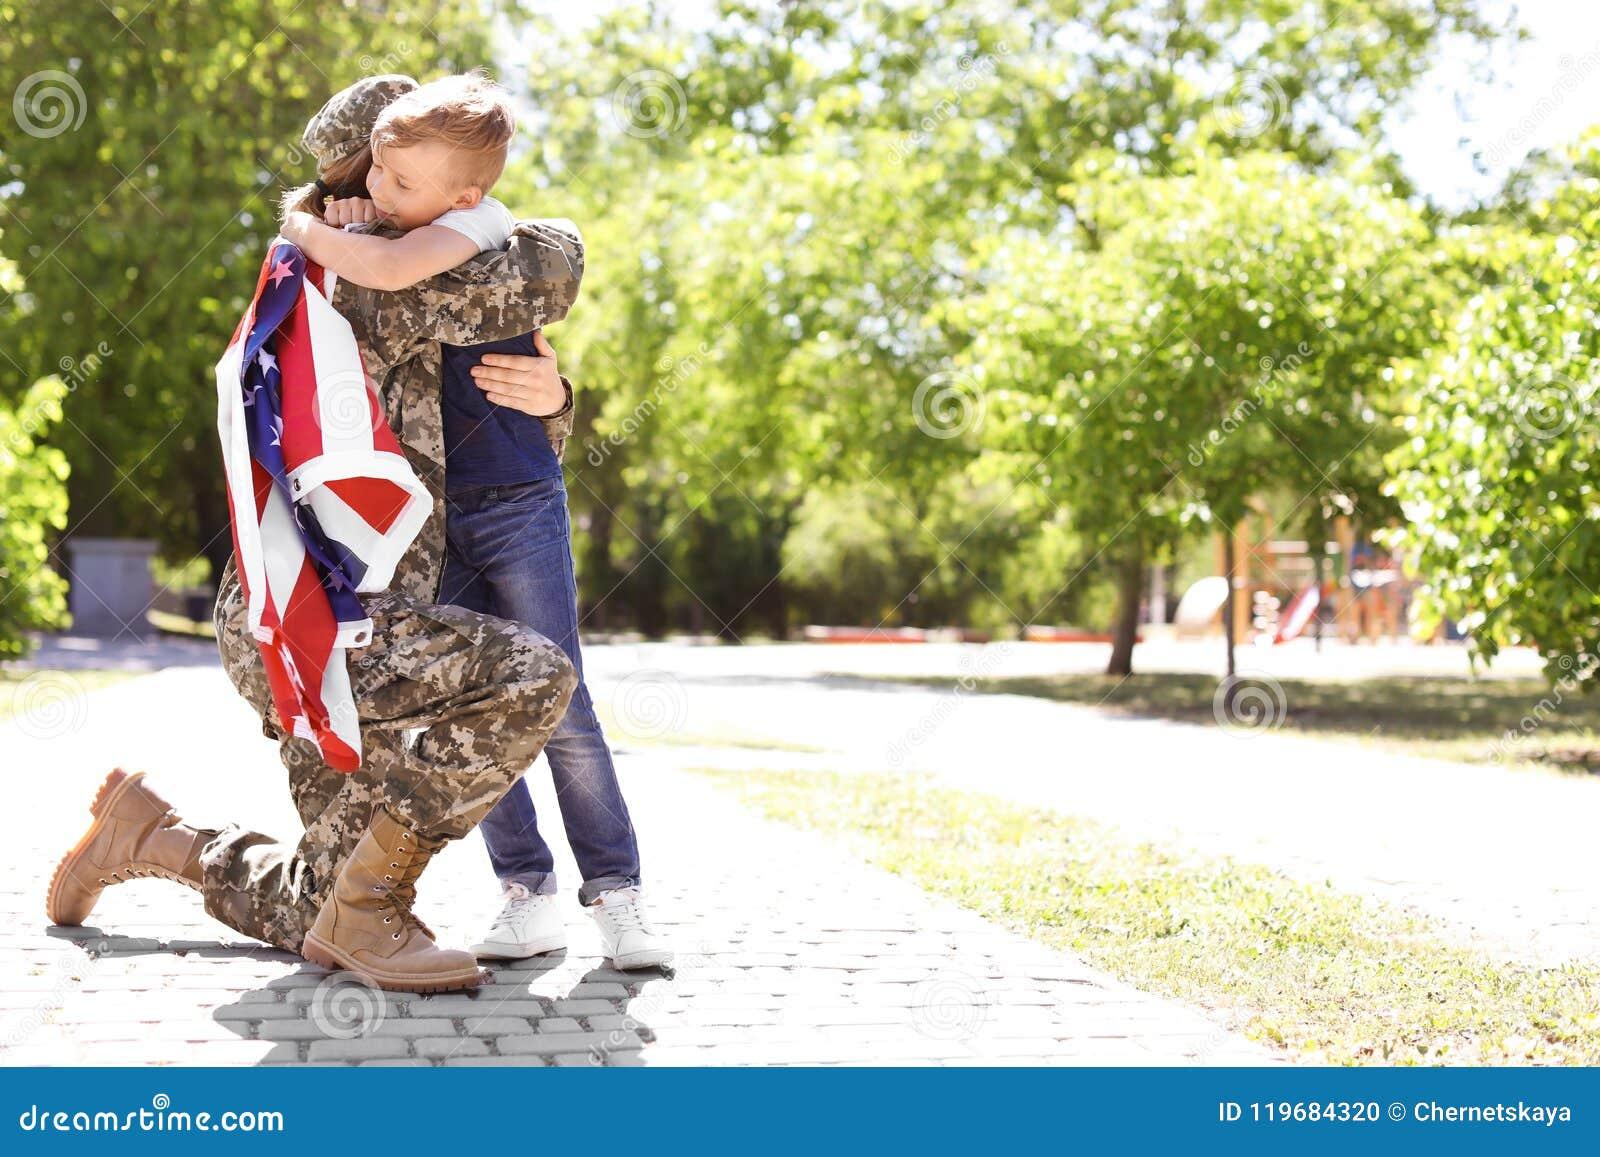 Amerikaanse militair met haar zoon in openlucht Legerdienst